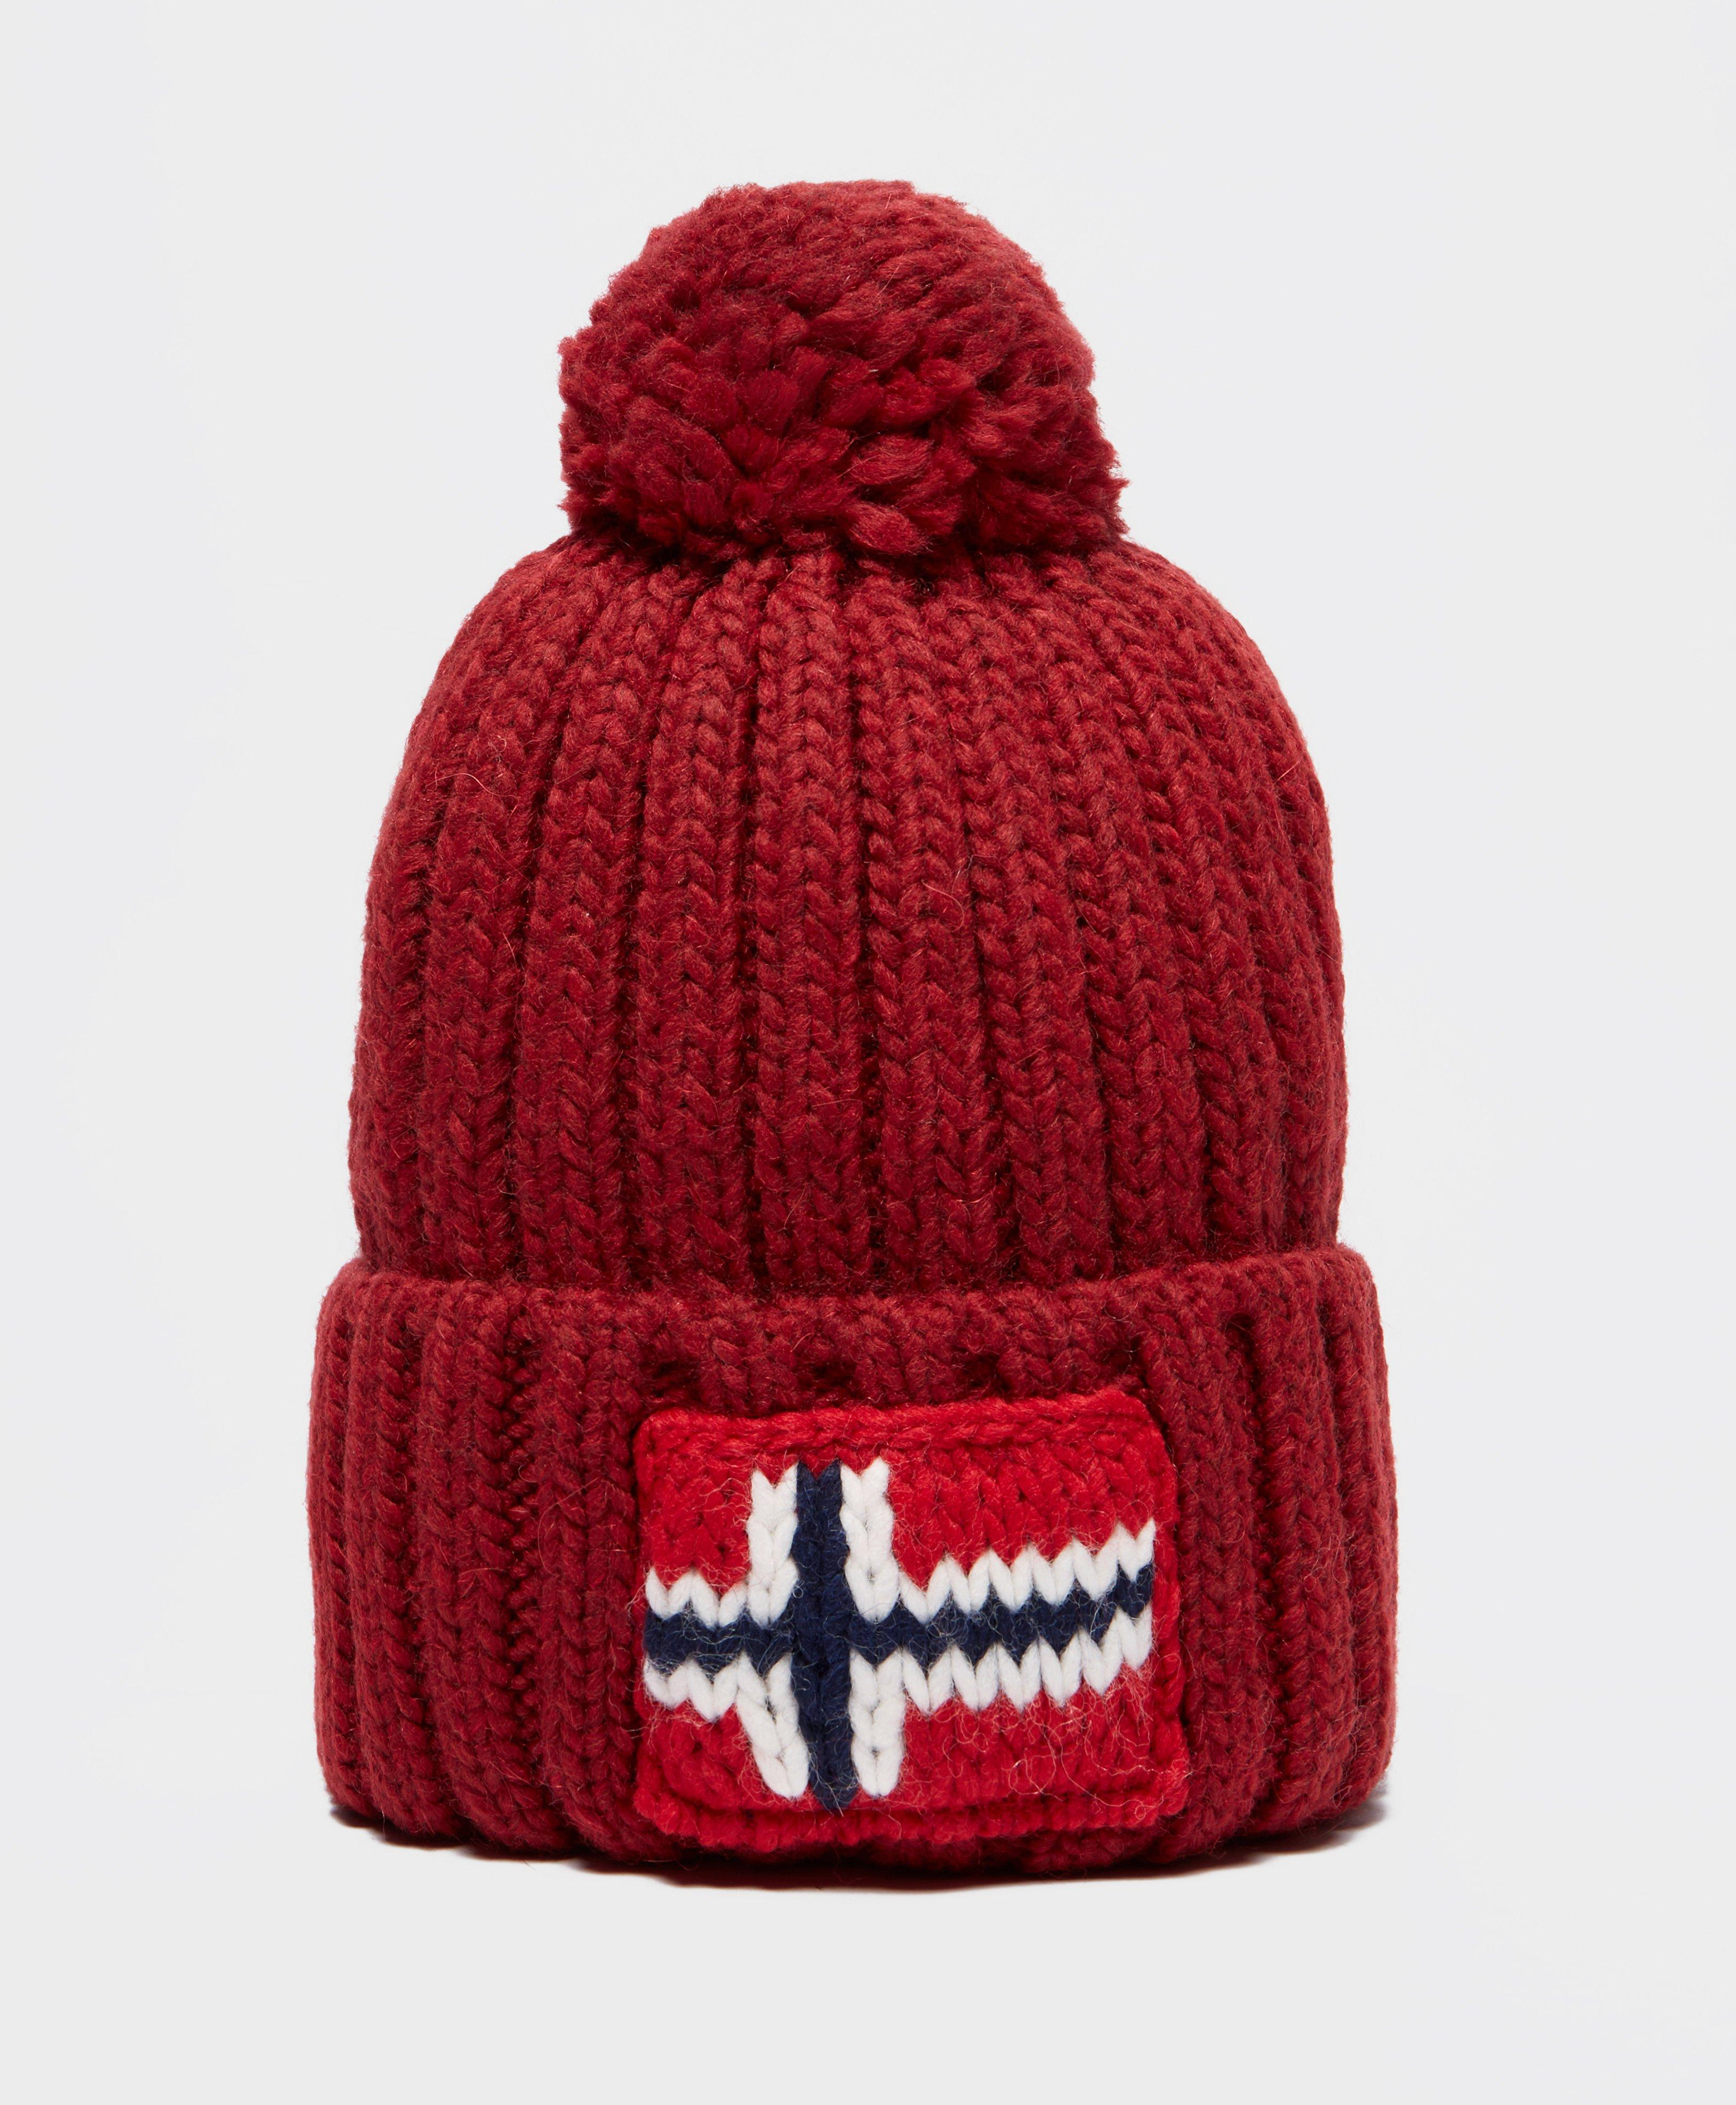 3d77fd4ac5f Napapijri Semiury Bobble Hat in Red for Men - Lyst